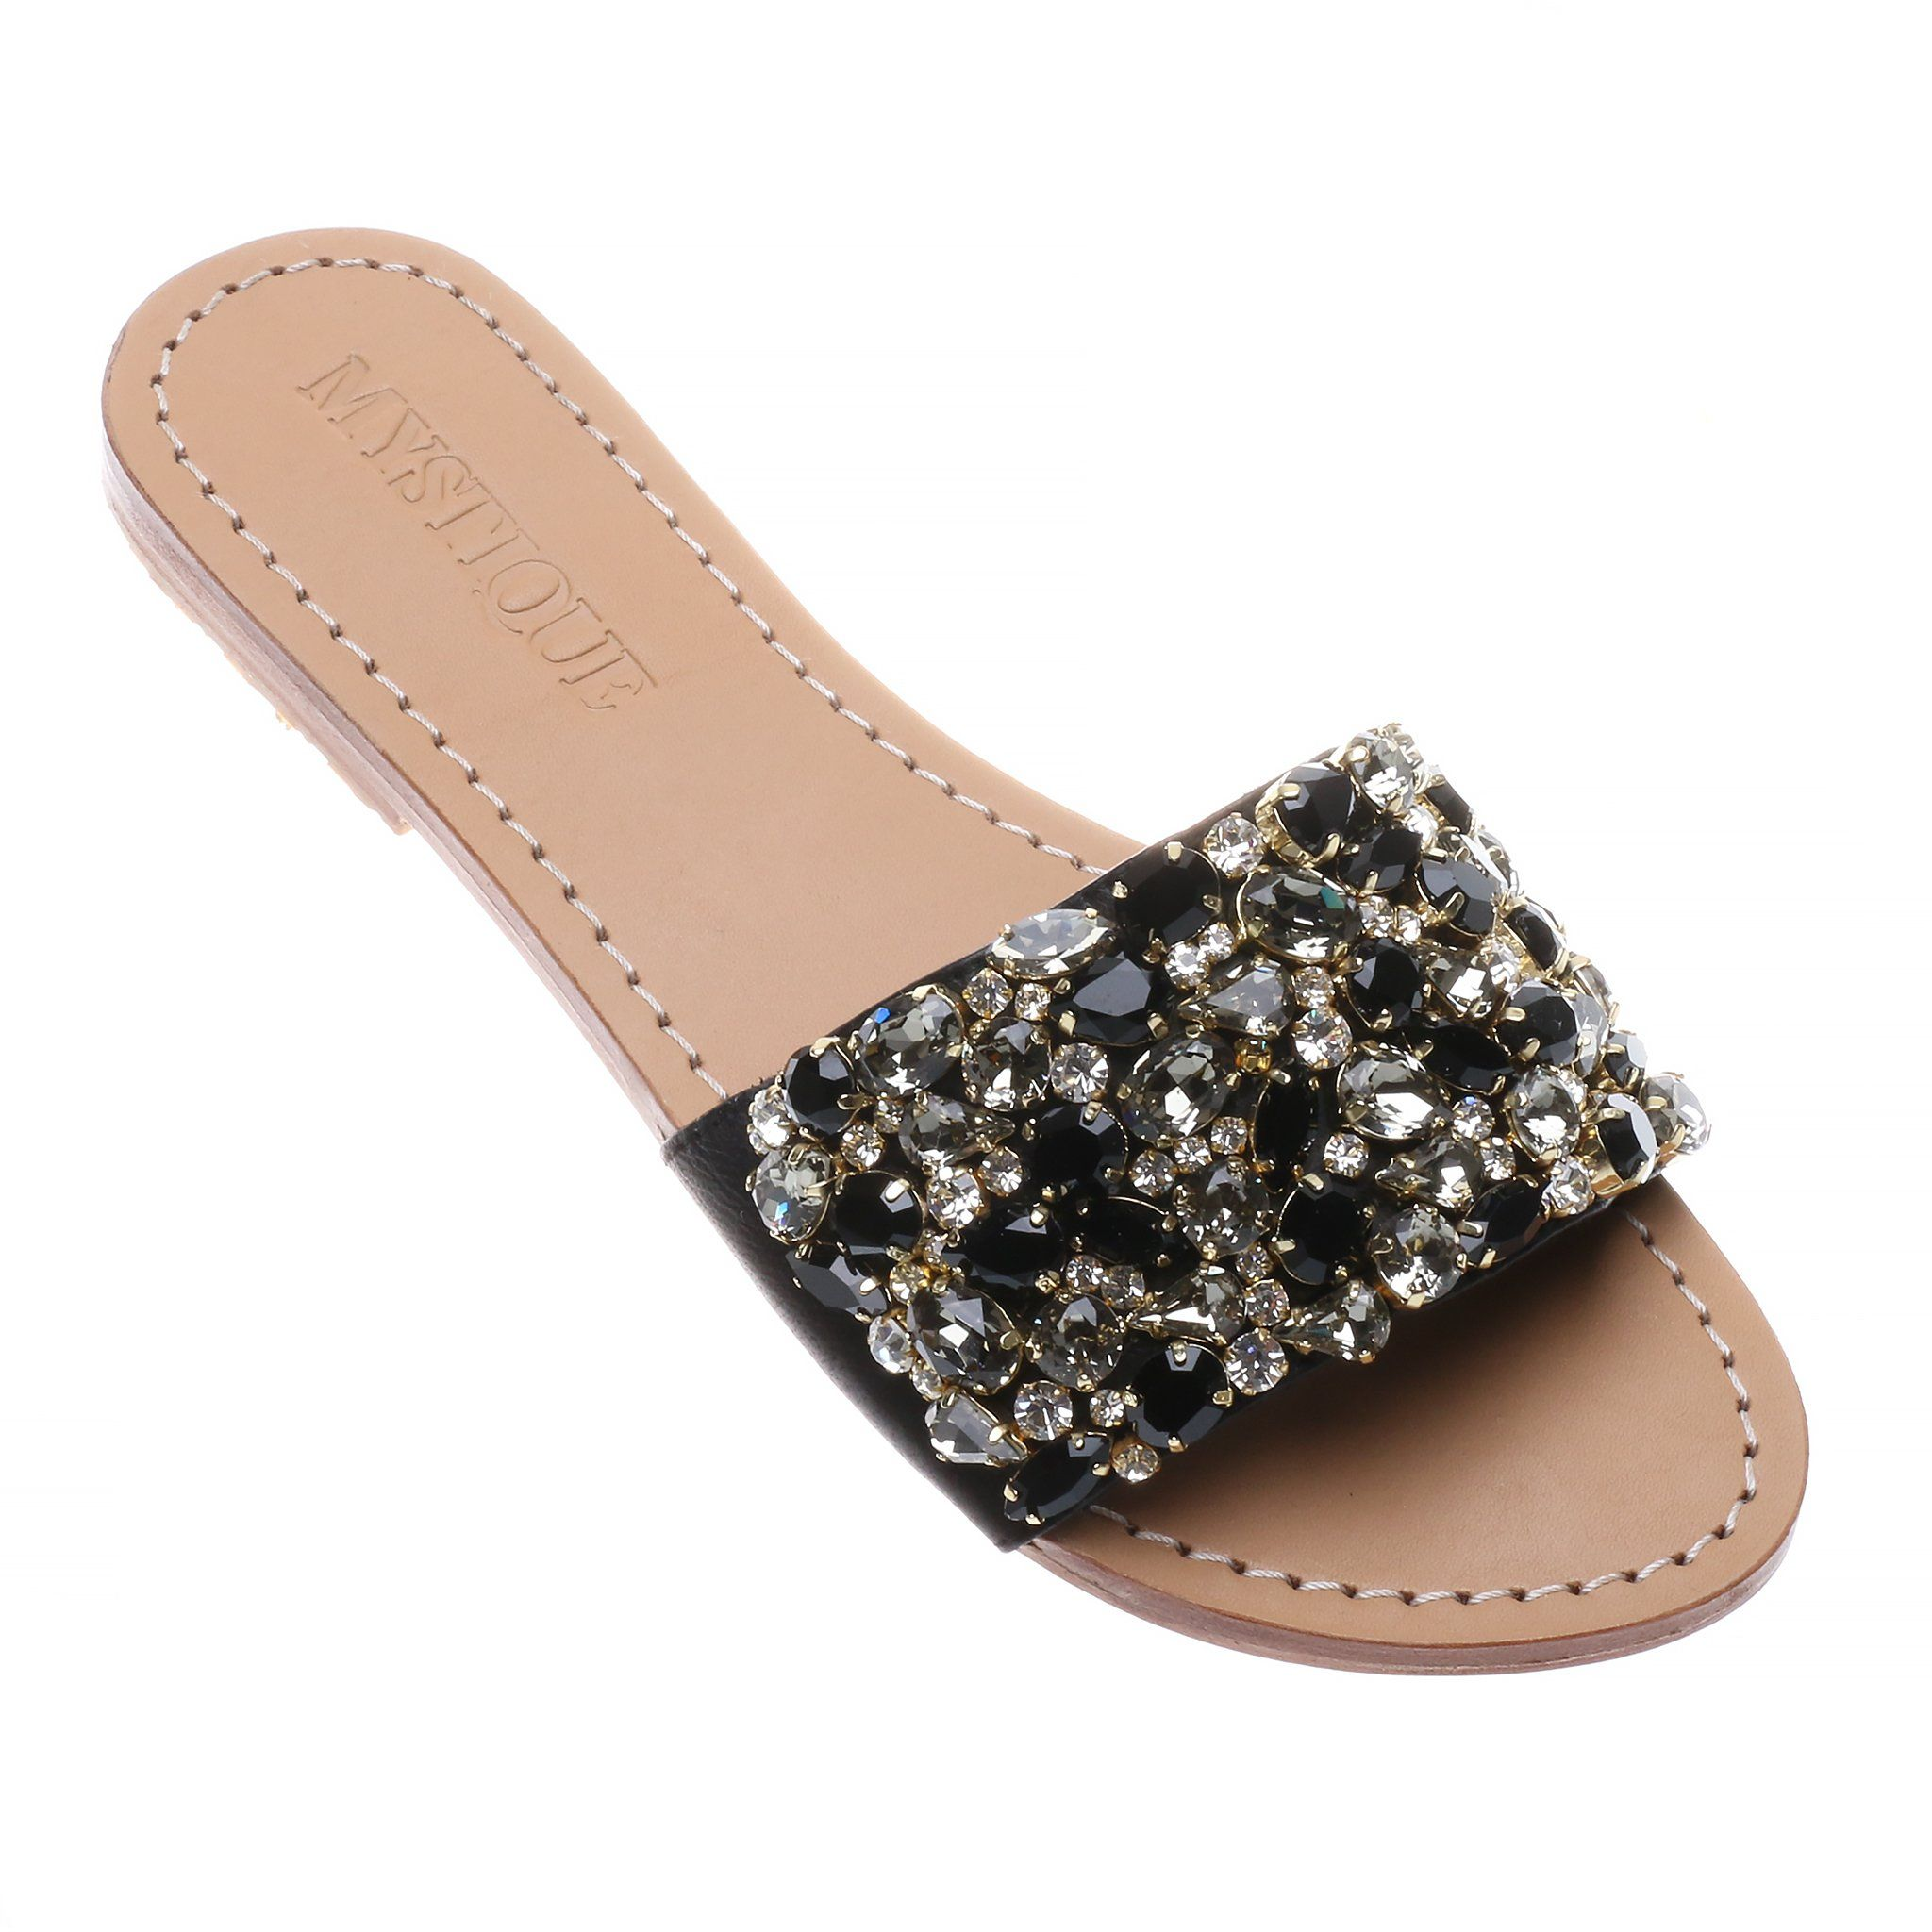 0abea0e57e1791 Cannon - Women s Black Jeweled Slide Sandals